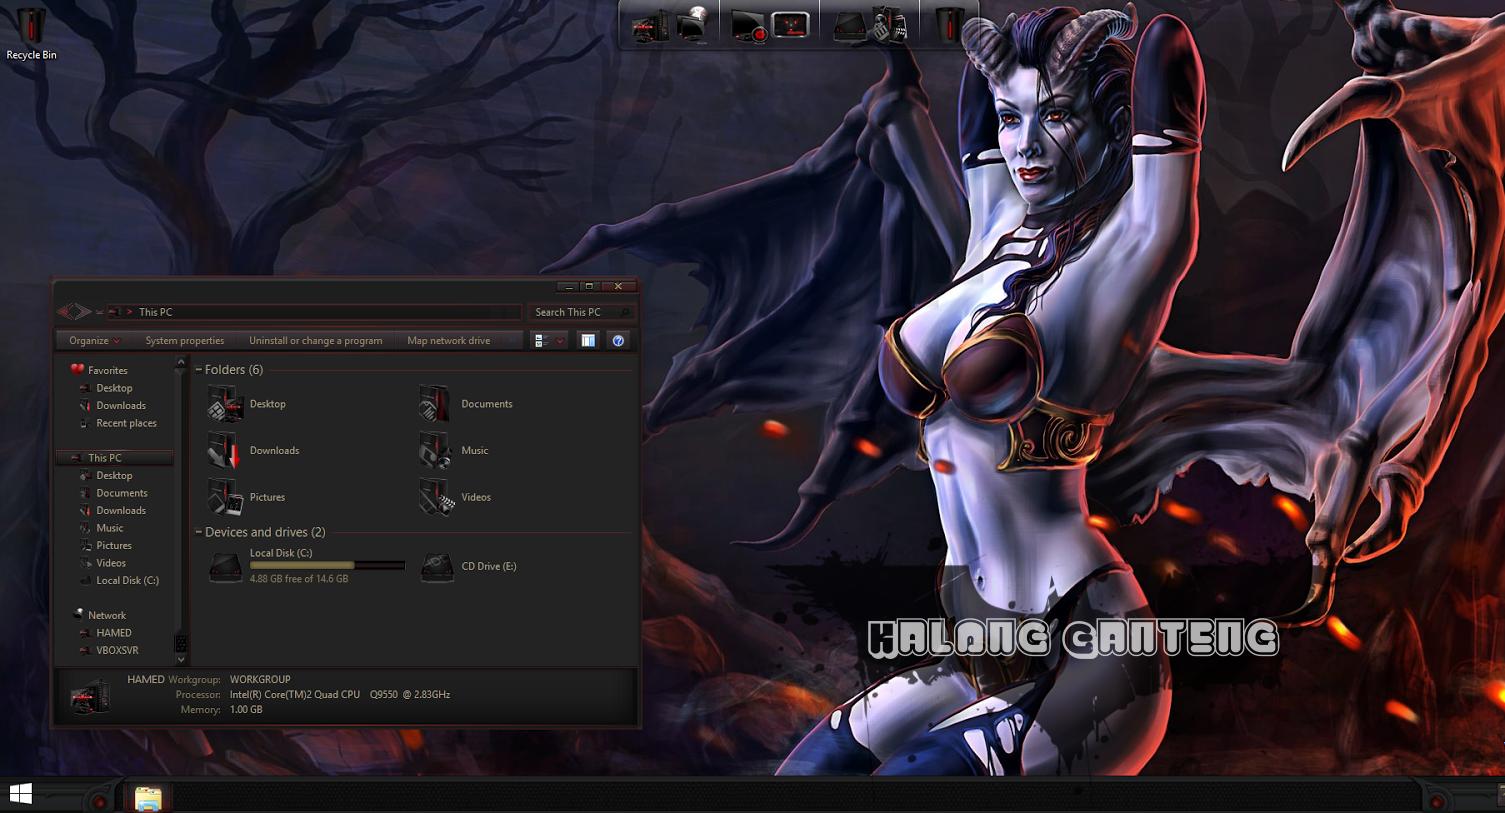 DOTA2 SkinPack Screenshot windows 8/8.1